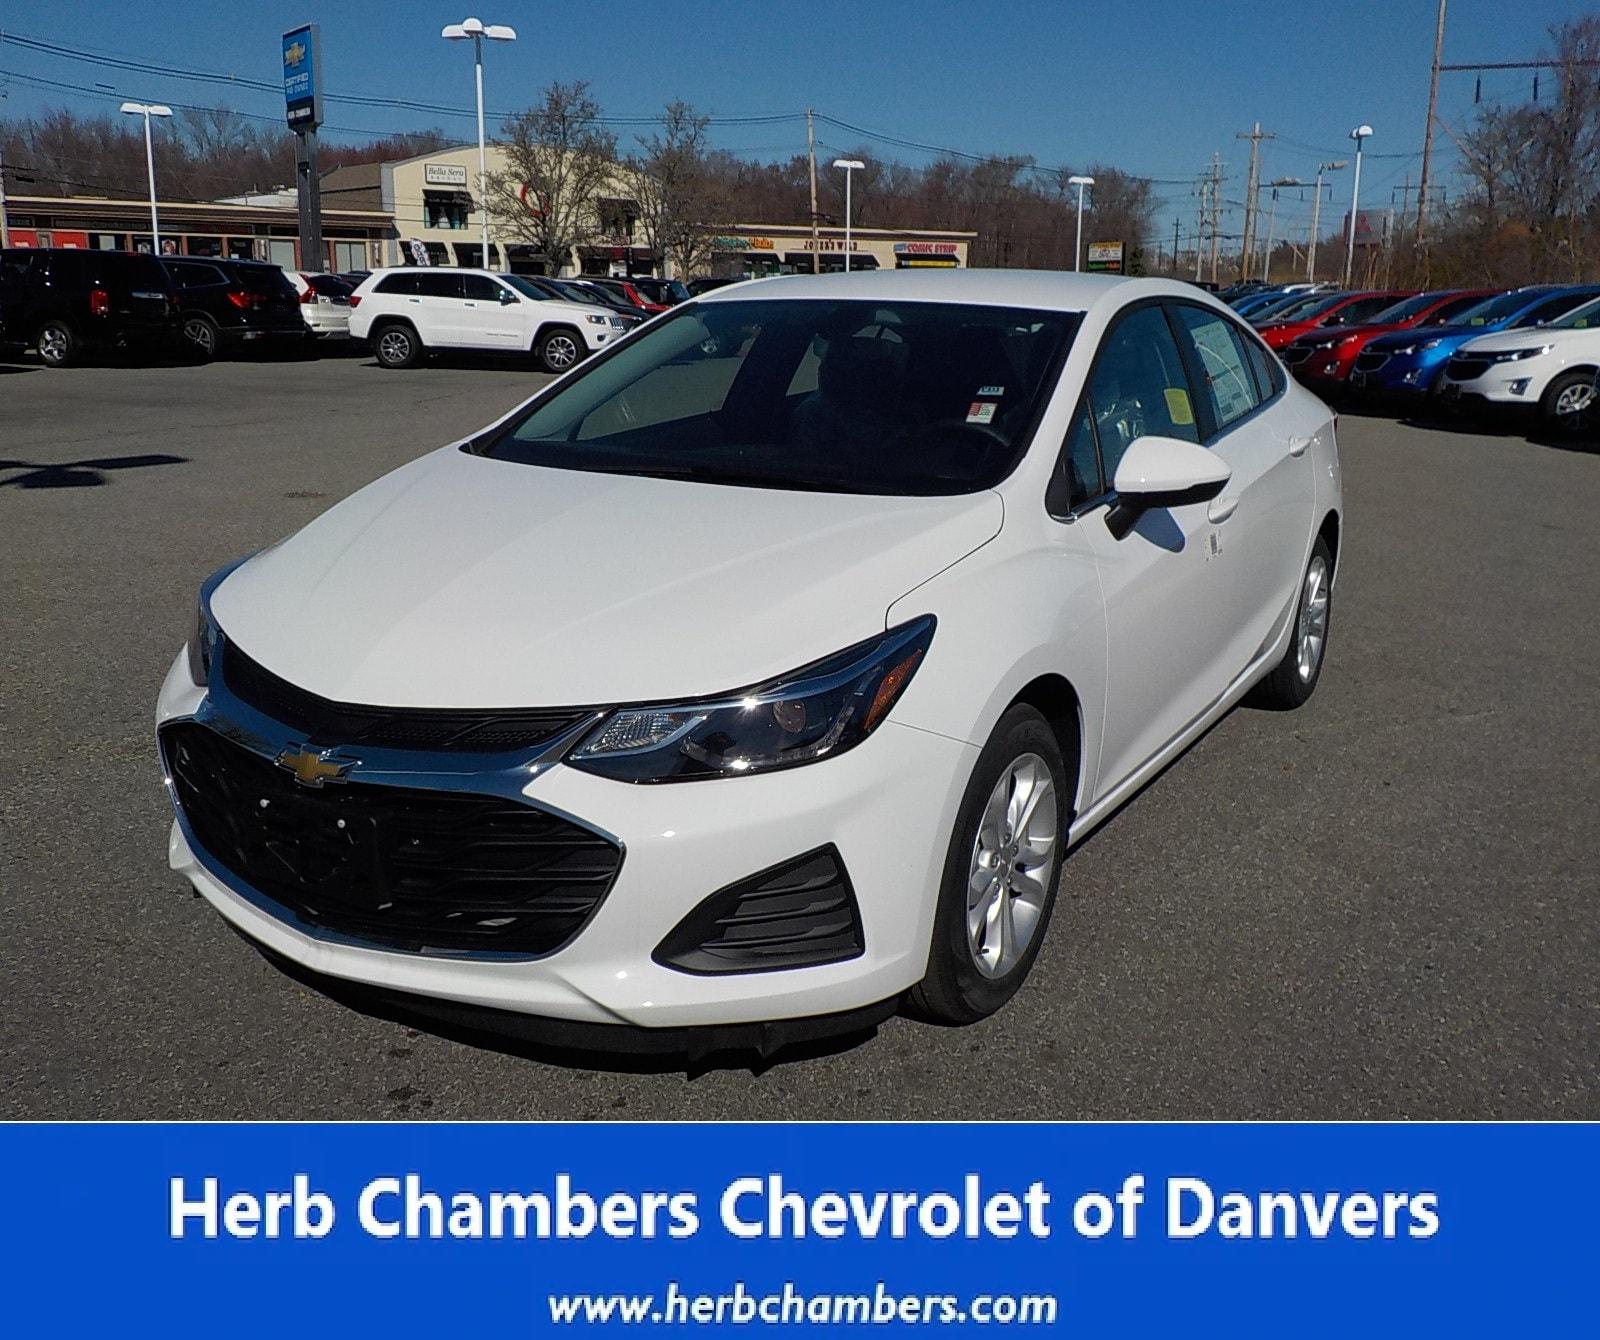 Chevrolet Cruze In Danvers & Wakefield, MA